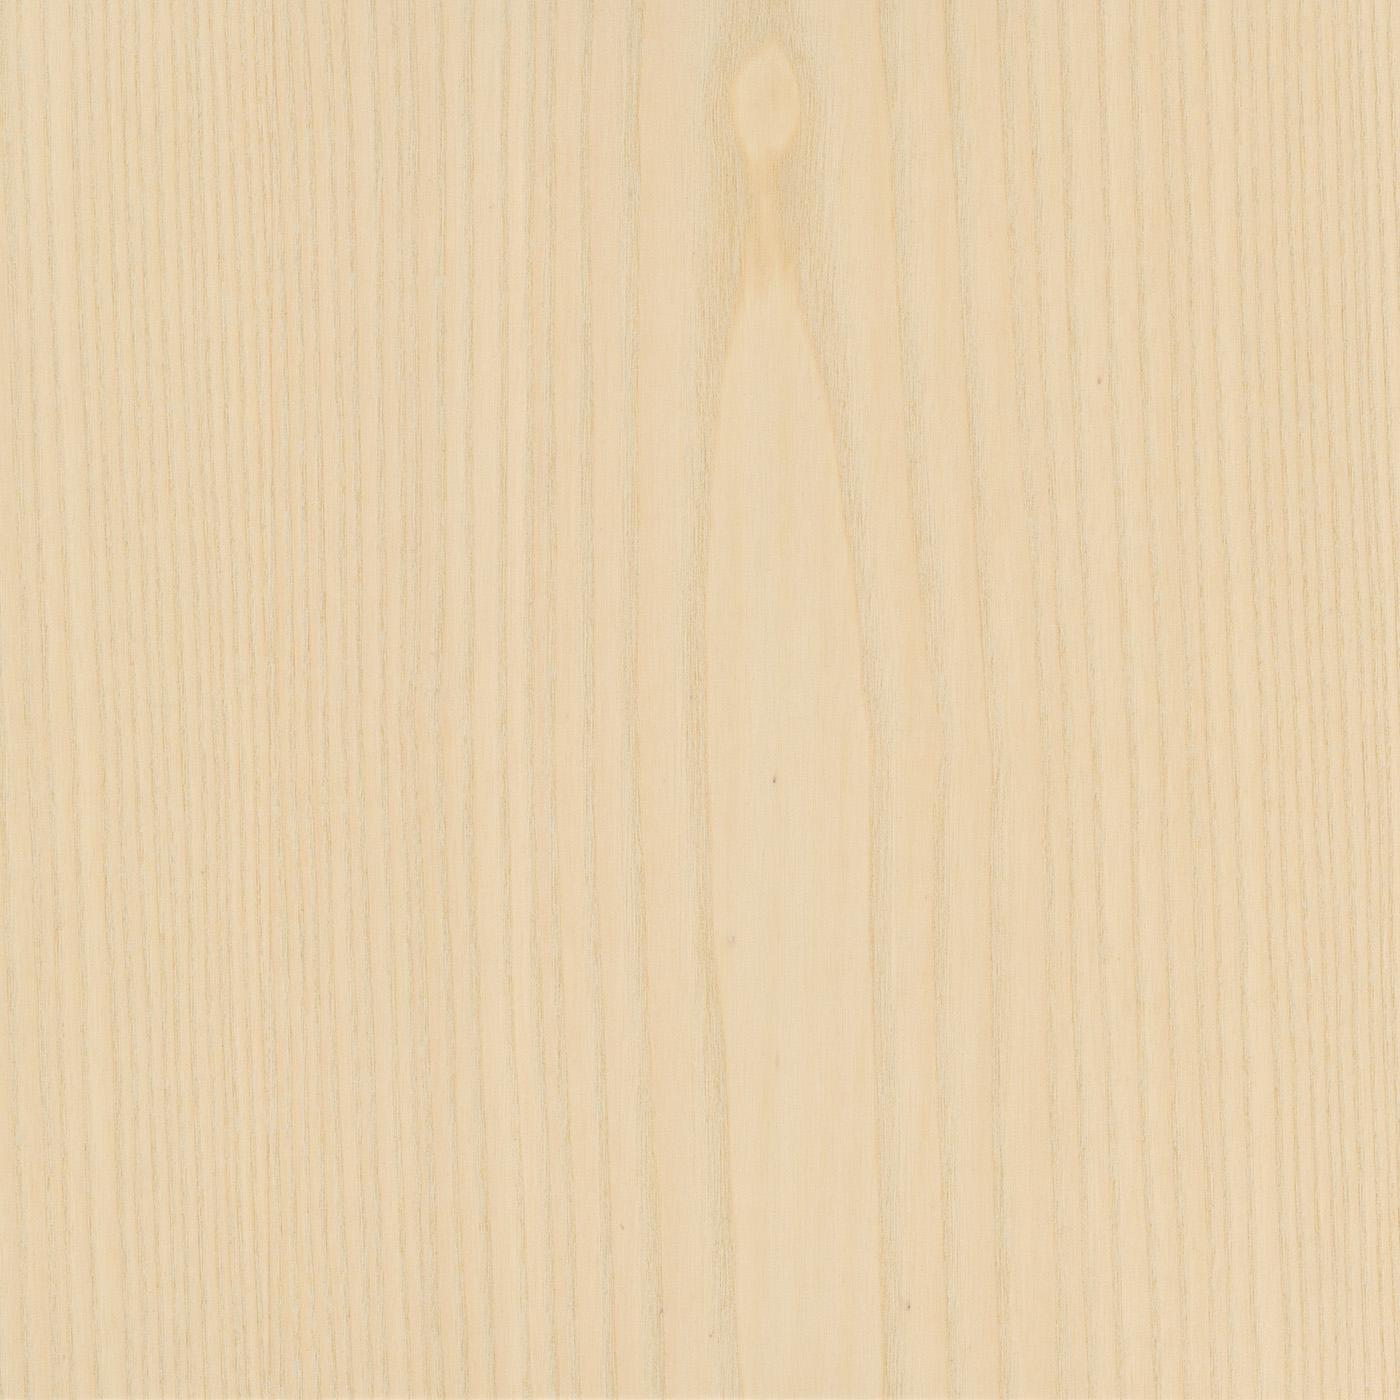 Oak Cabinet Kitchen Veneer Art